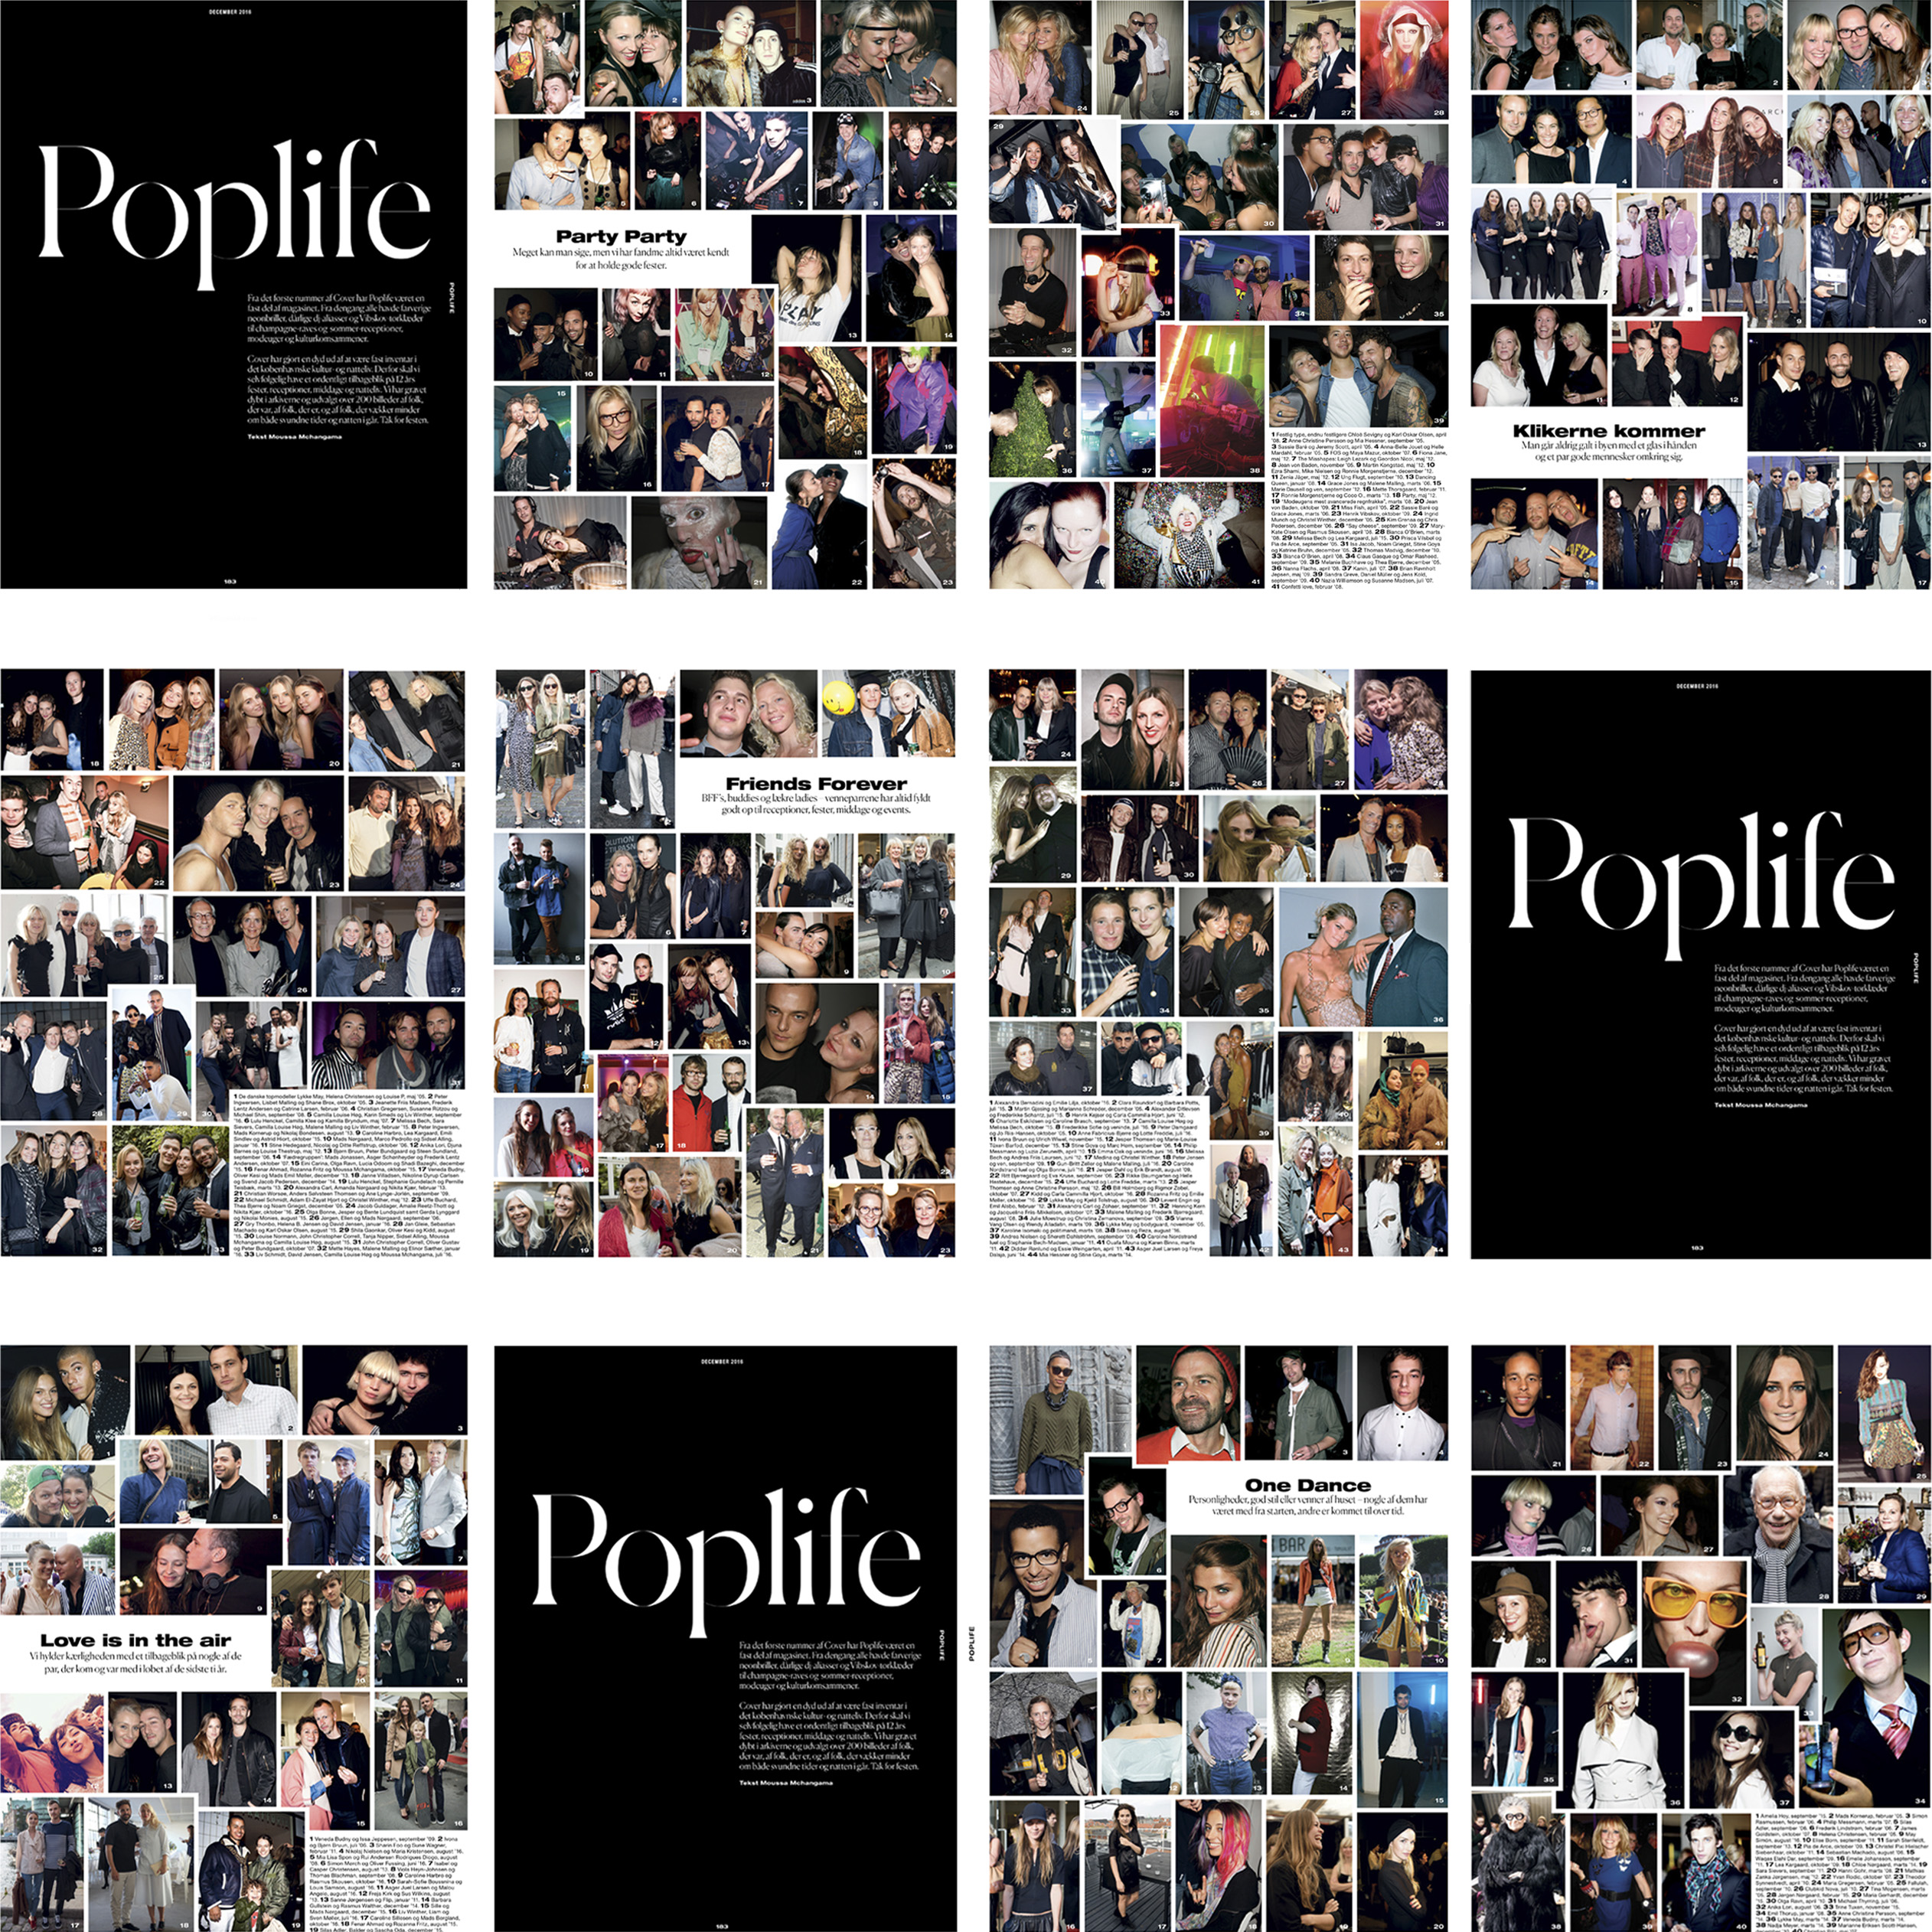 poplife_cover_instagram_helenalundquist